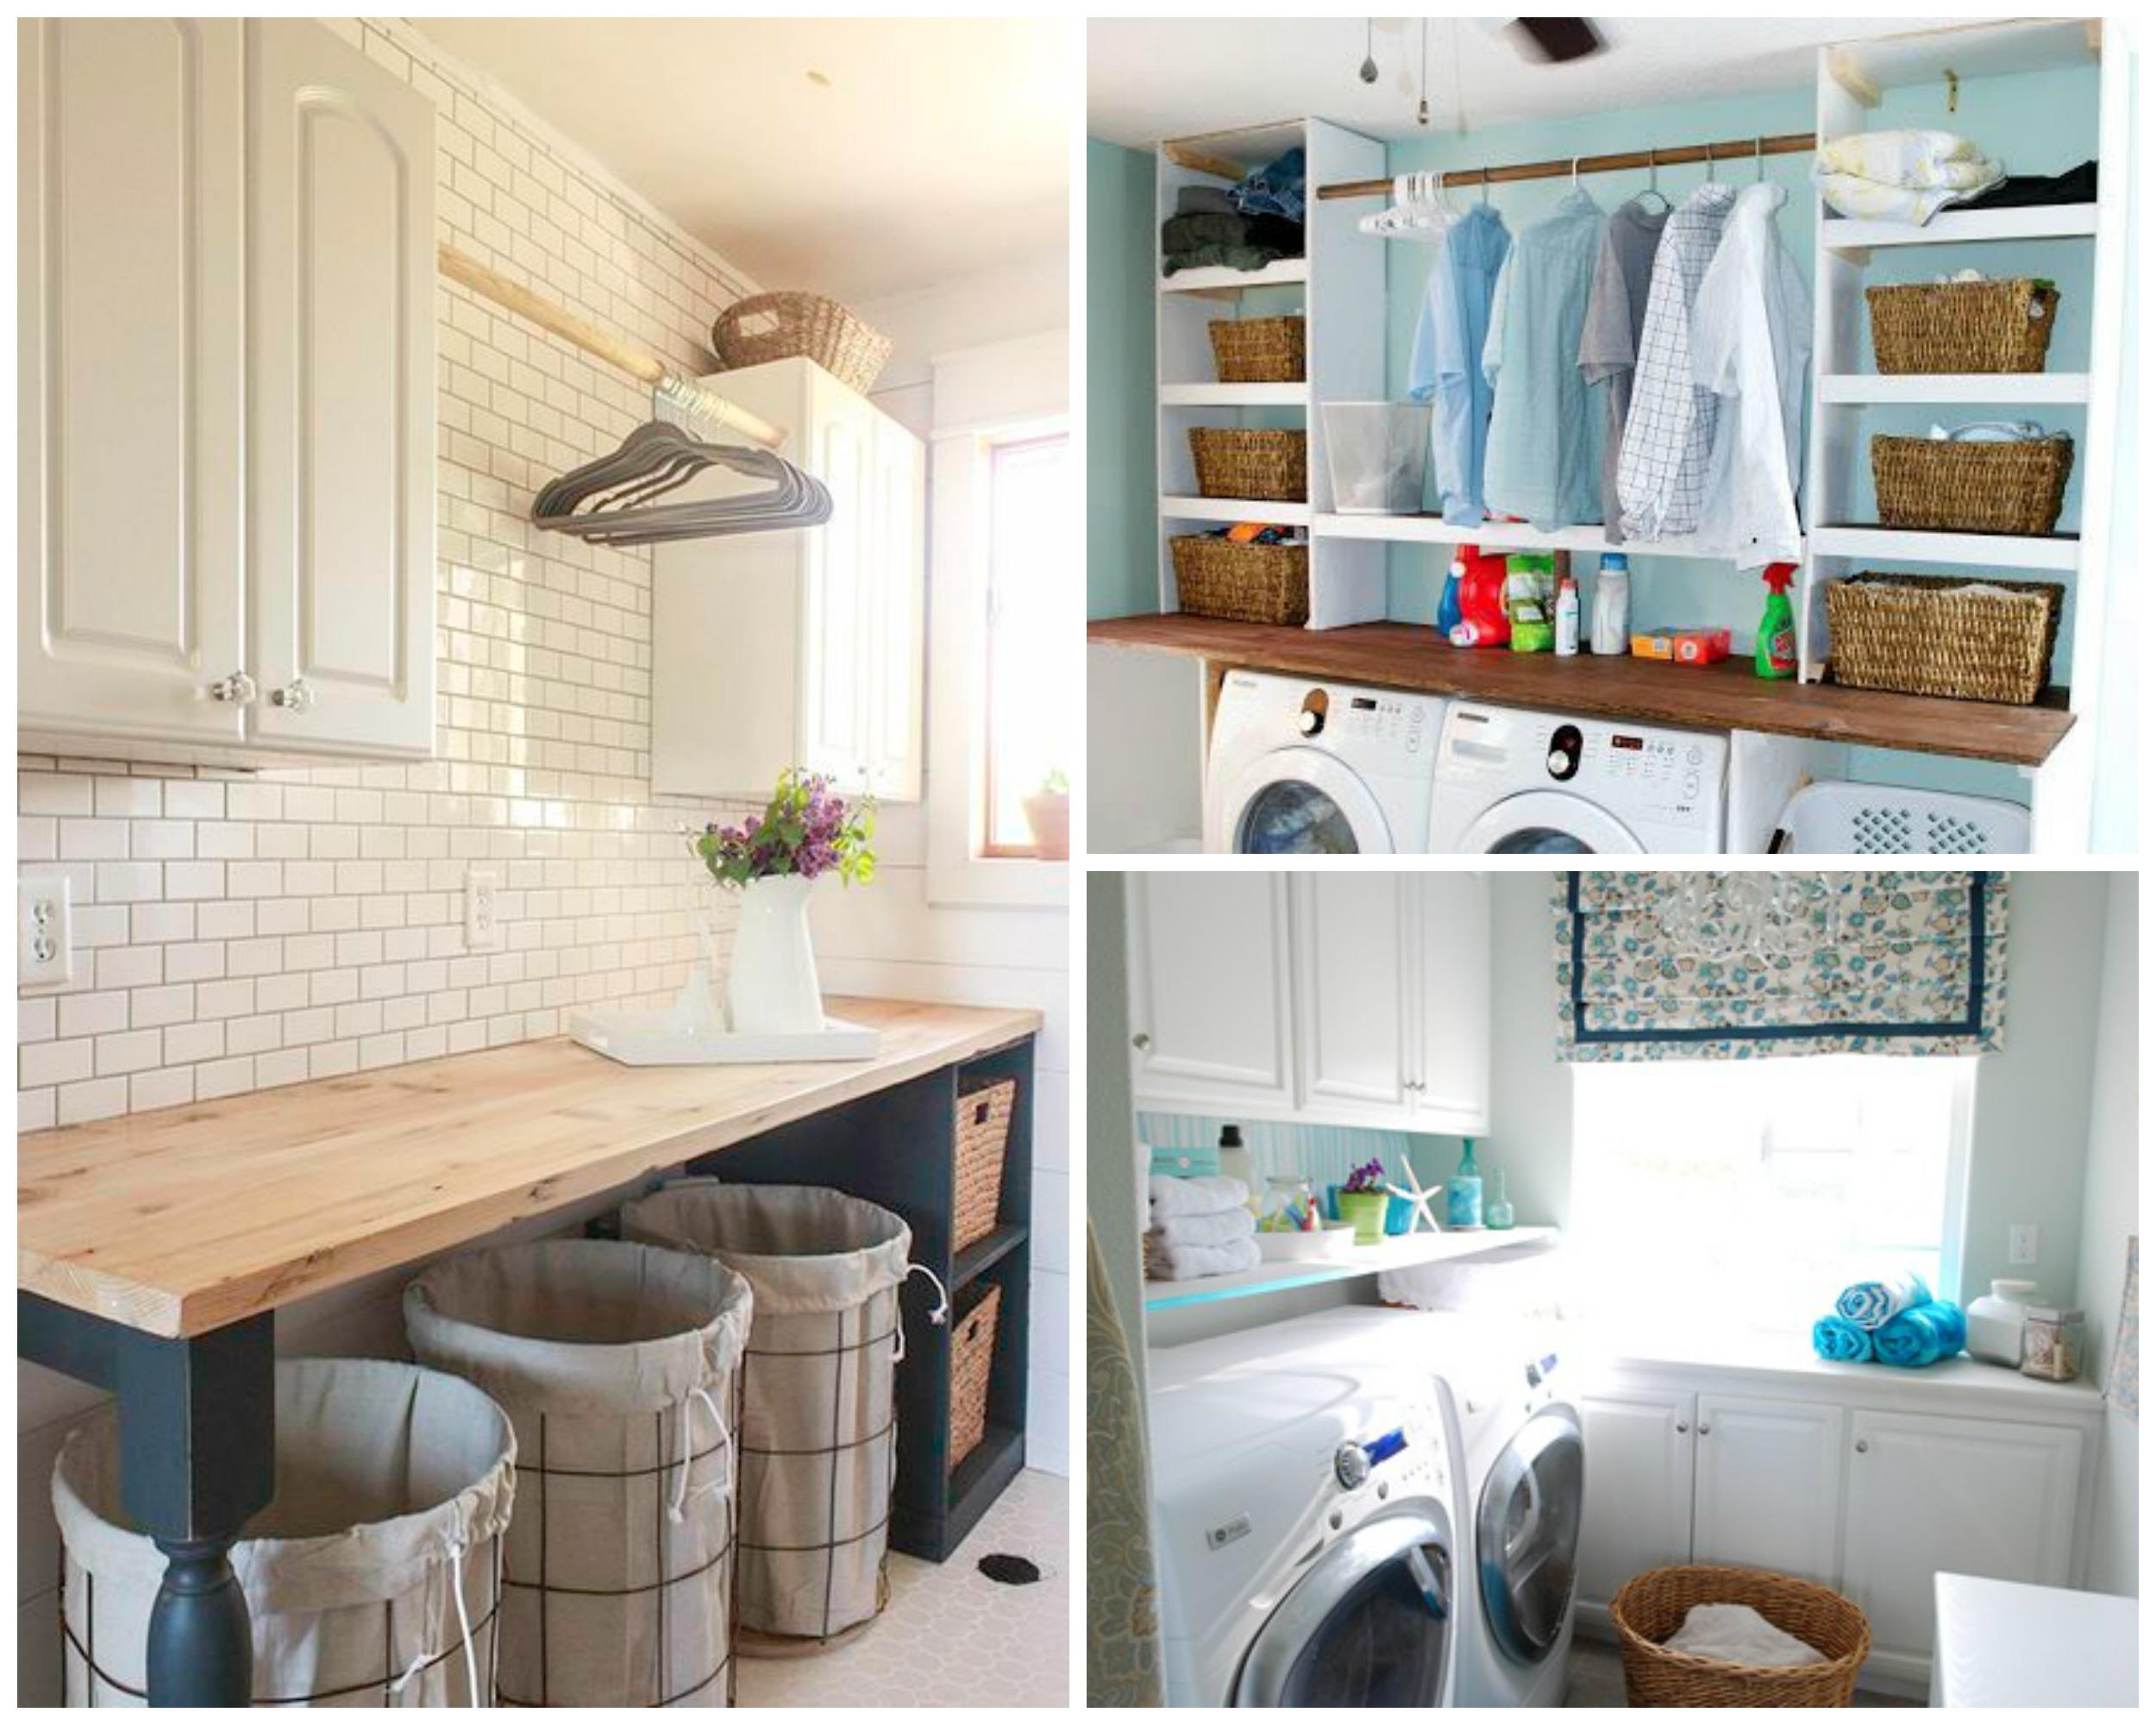 8 Laundry Room Organization Ideas You'll Actually Want to Try on Laundry Room Organization Ideas  id=50119